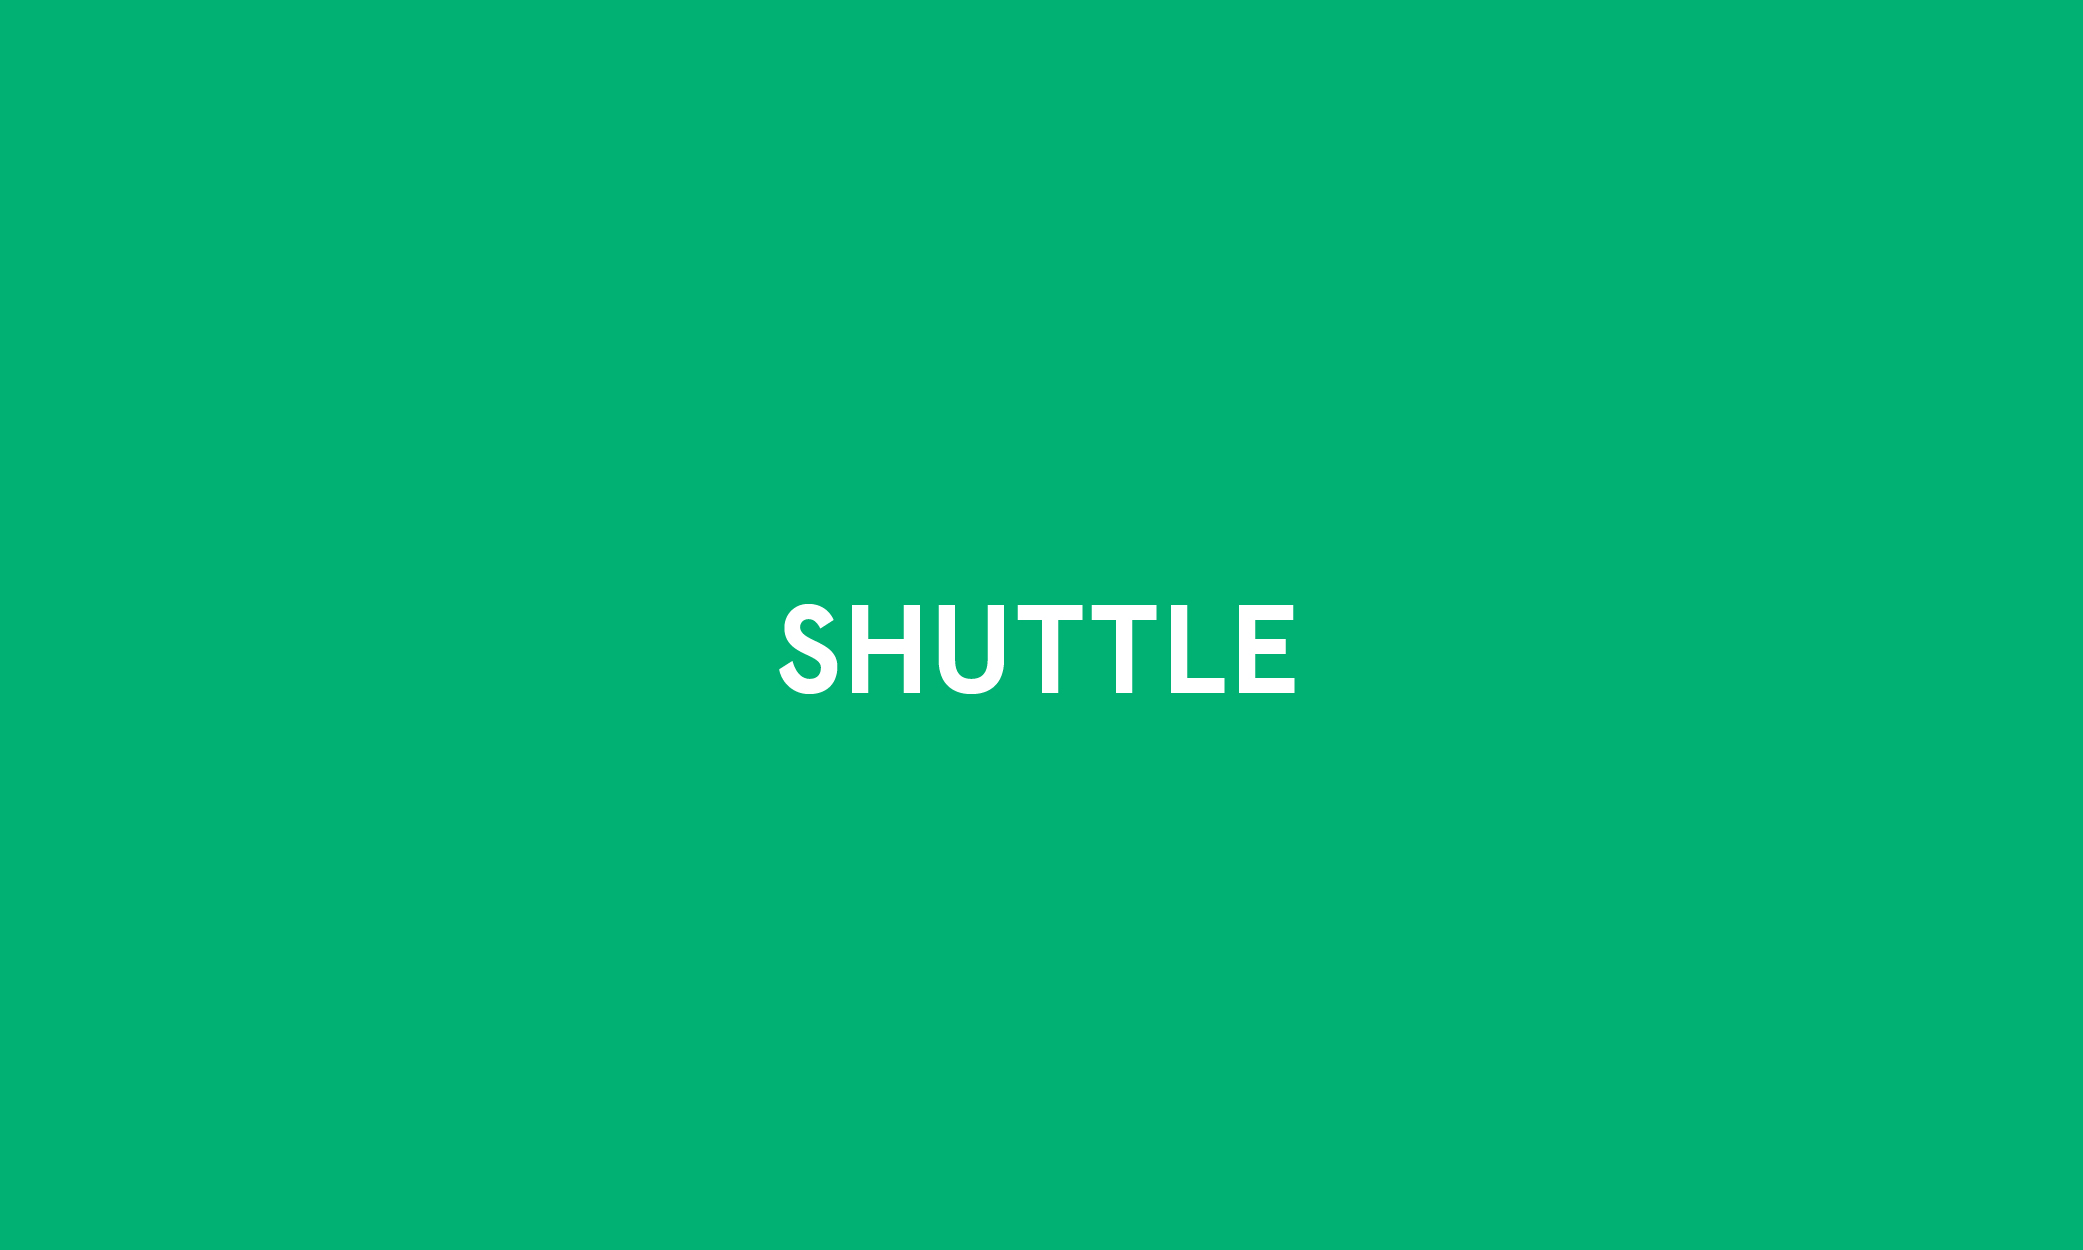 MSFV_Shuttle-01